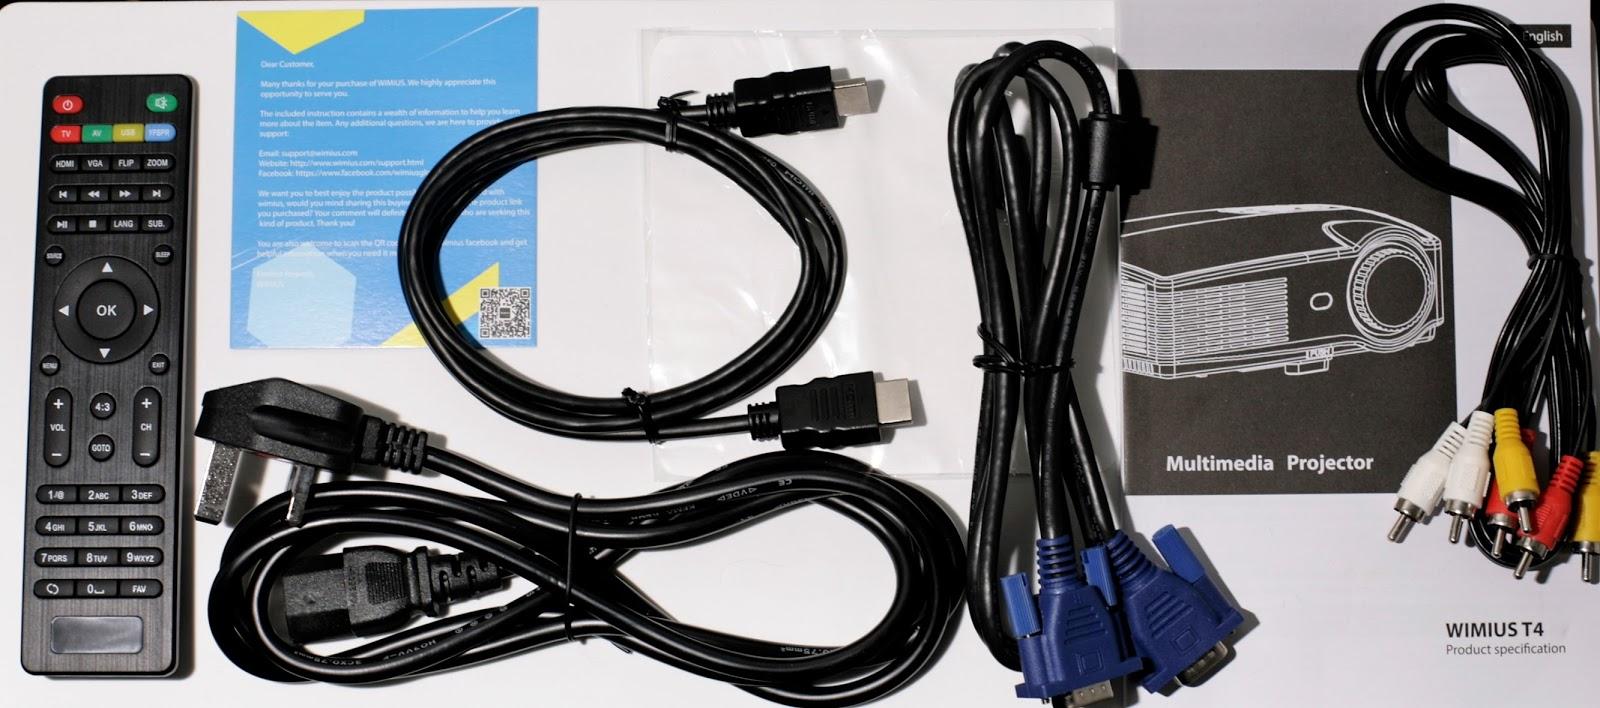 Wimius T4 3200 Lumen 1280 800 Projector Review